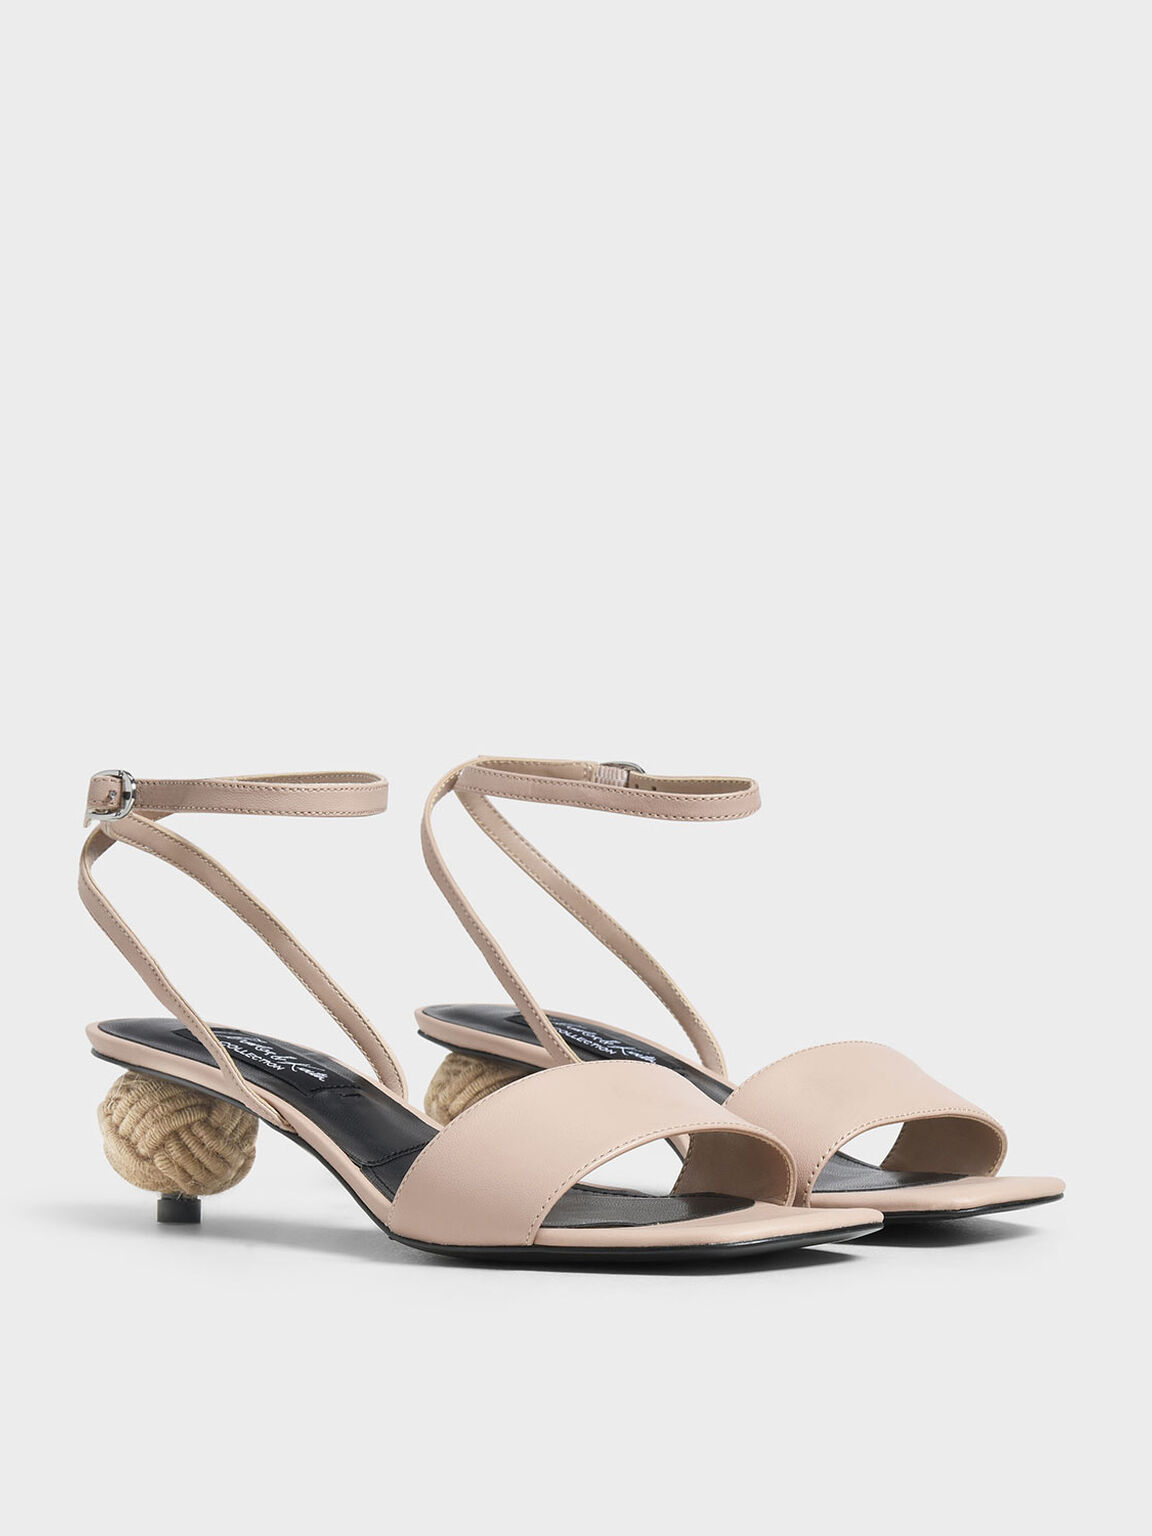 Spherical Heel Leather Sandals, Nude, hi-res